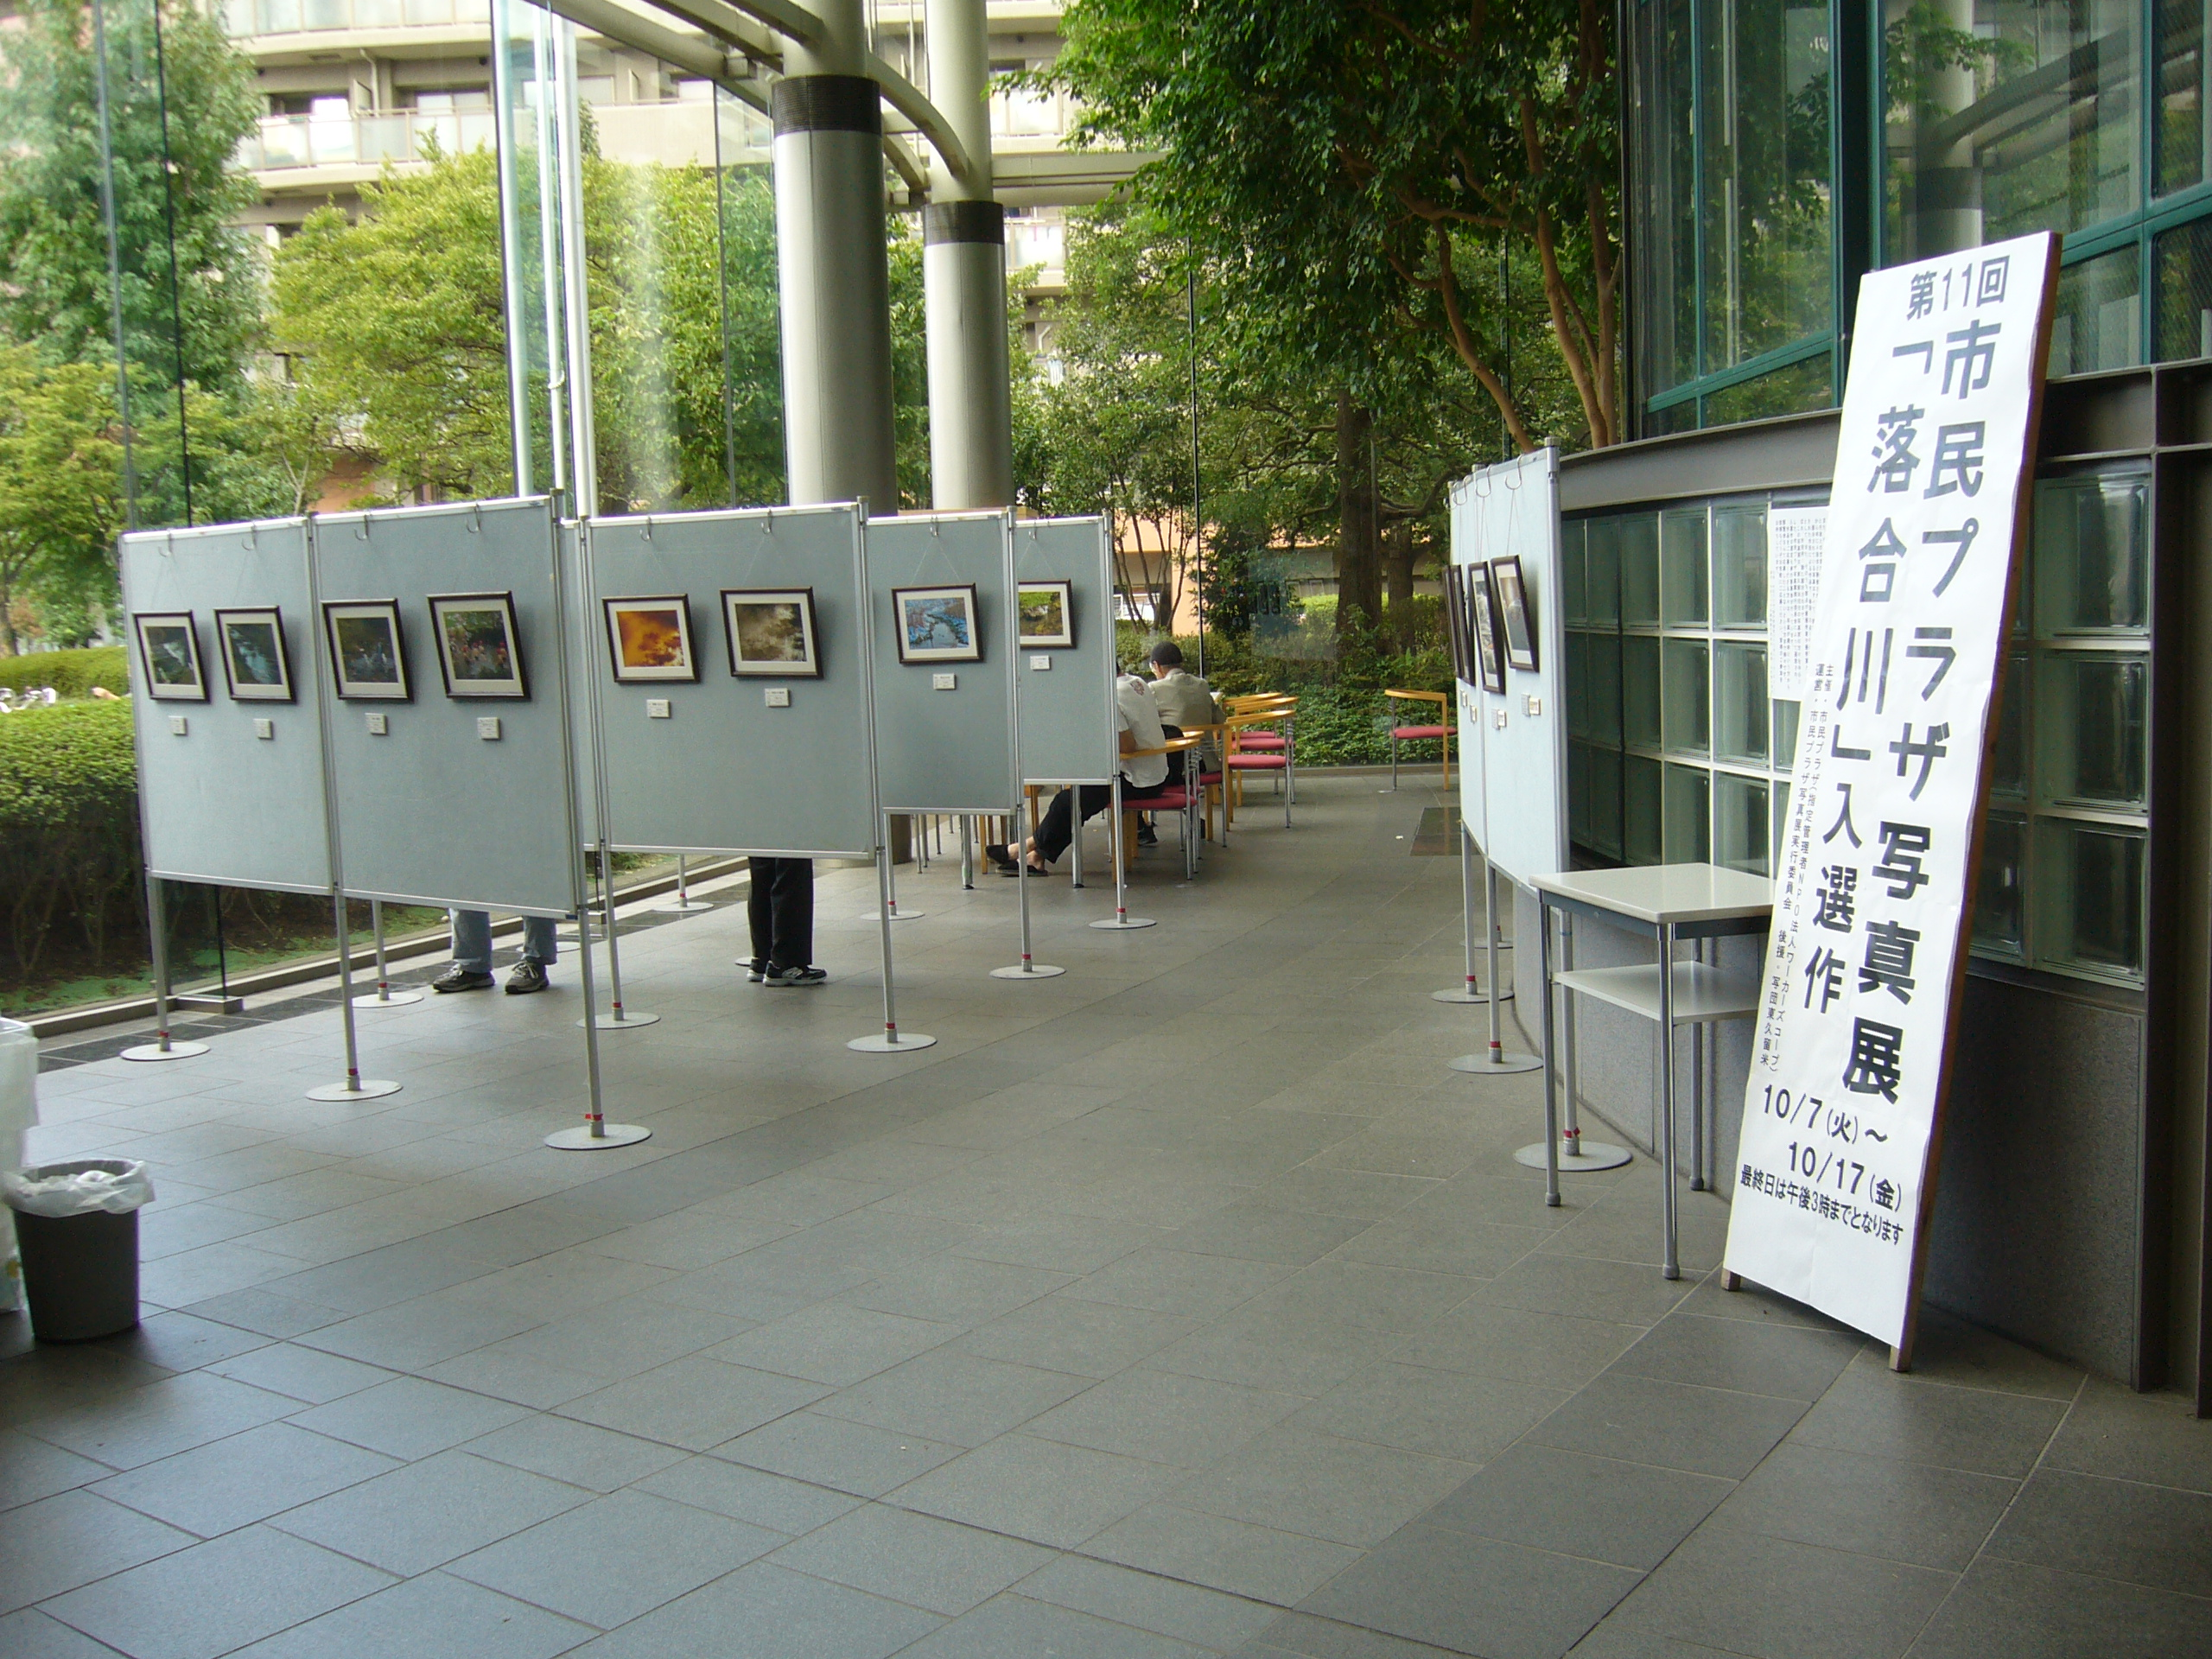 第11回市民プラザ写真展「落合川」展示中!